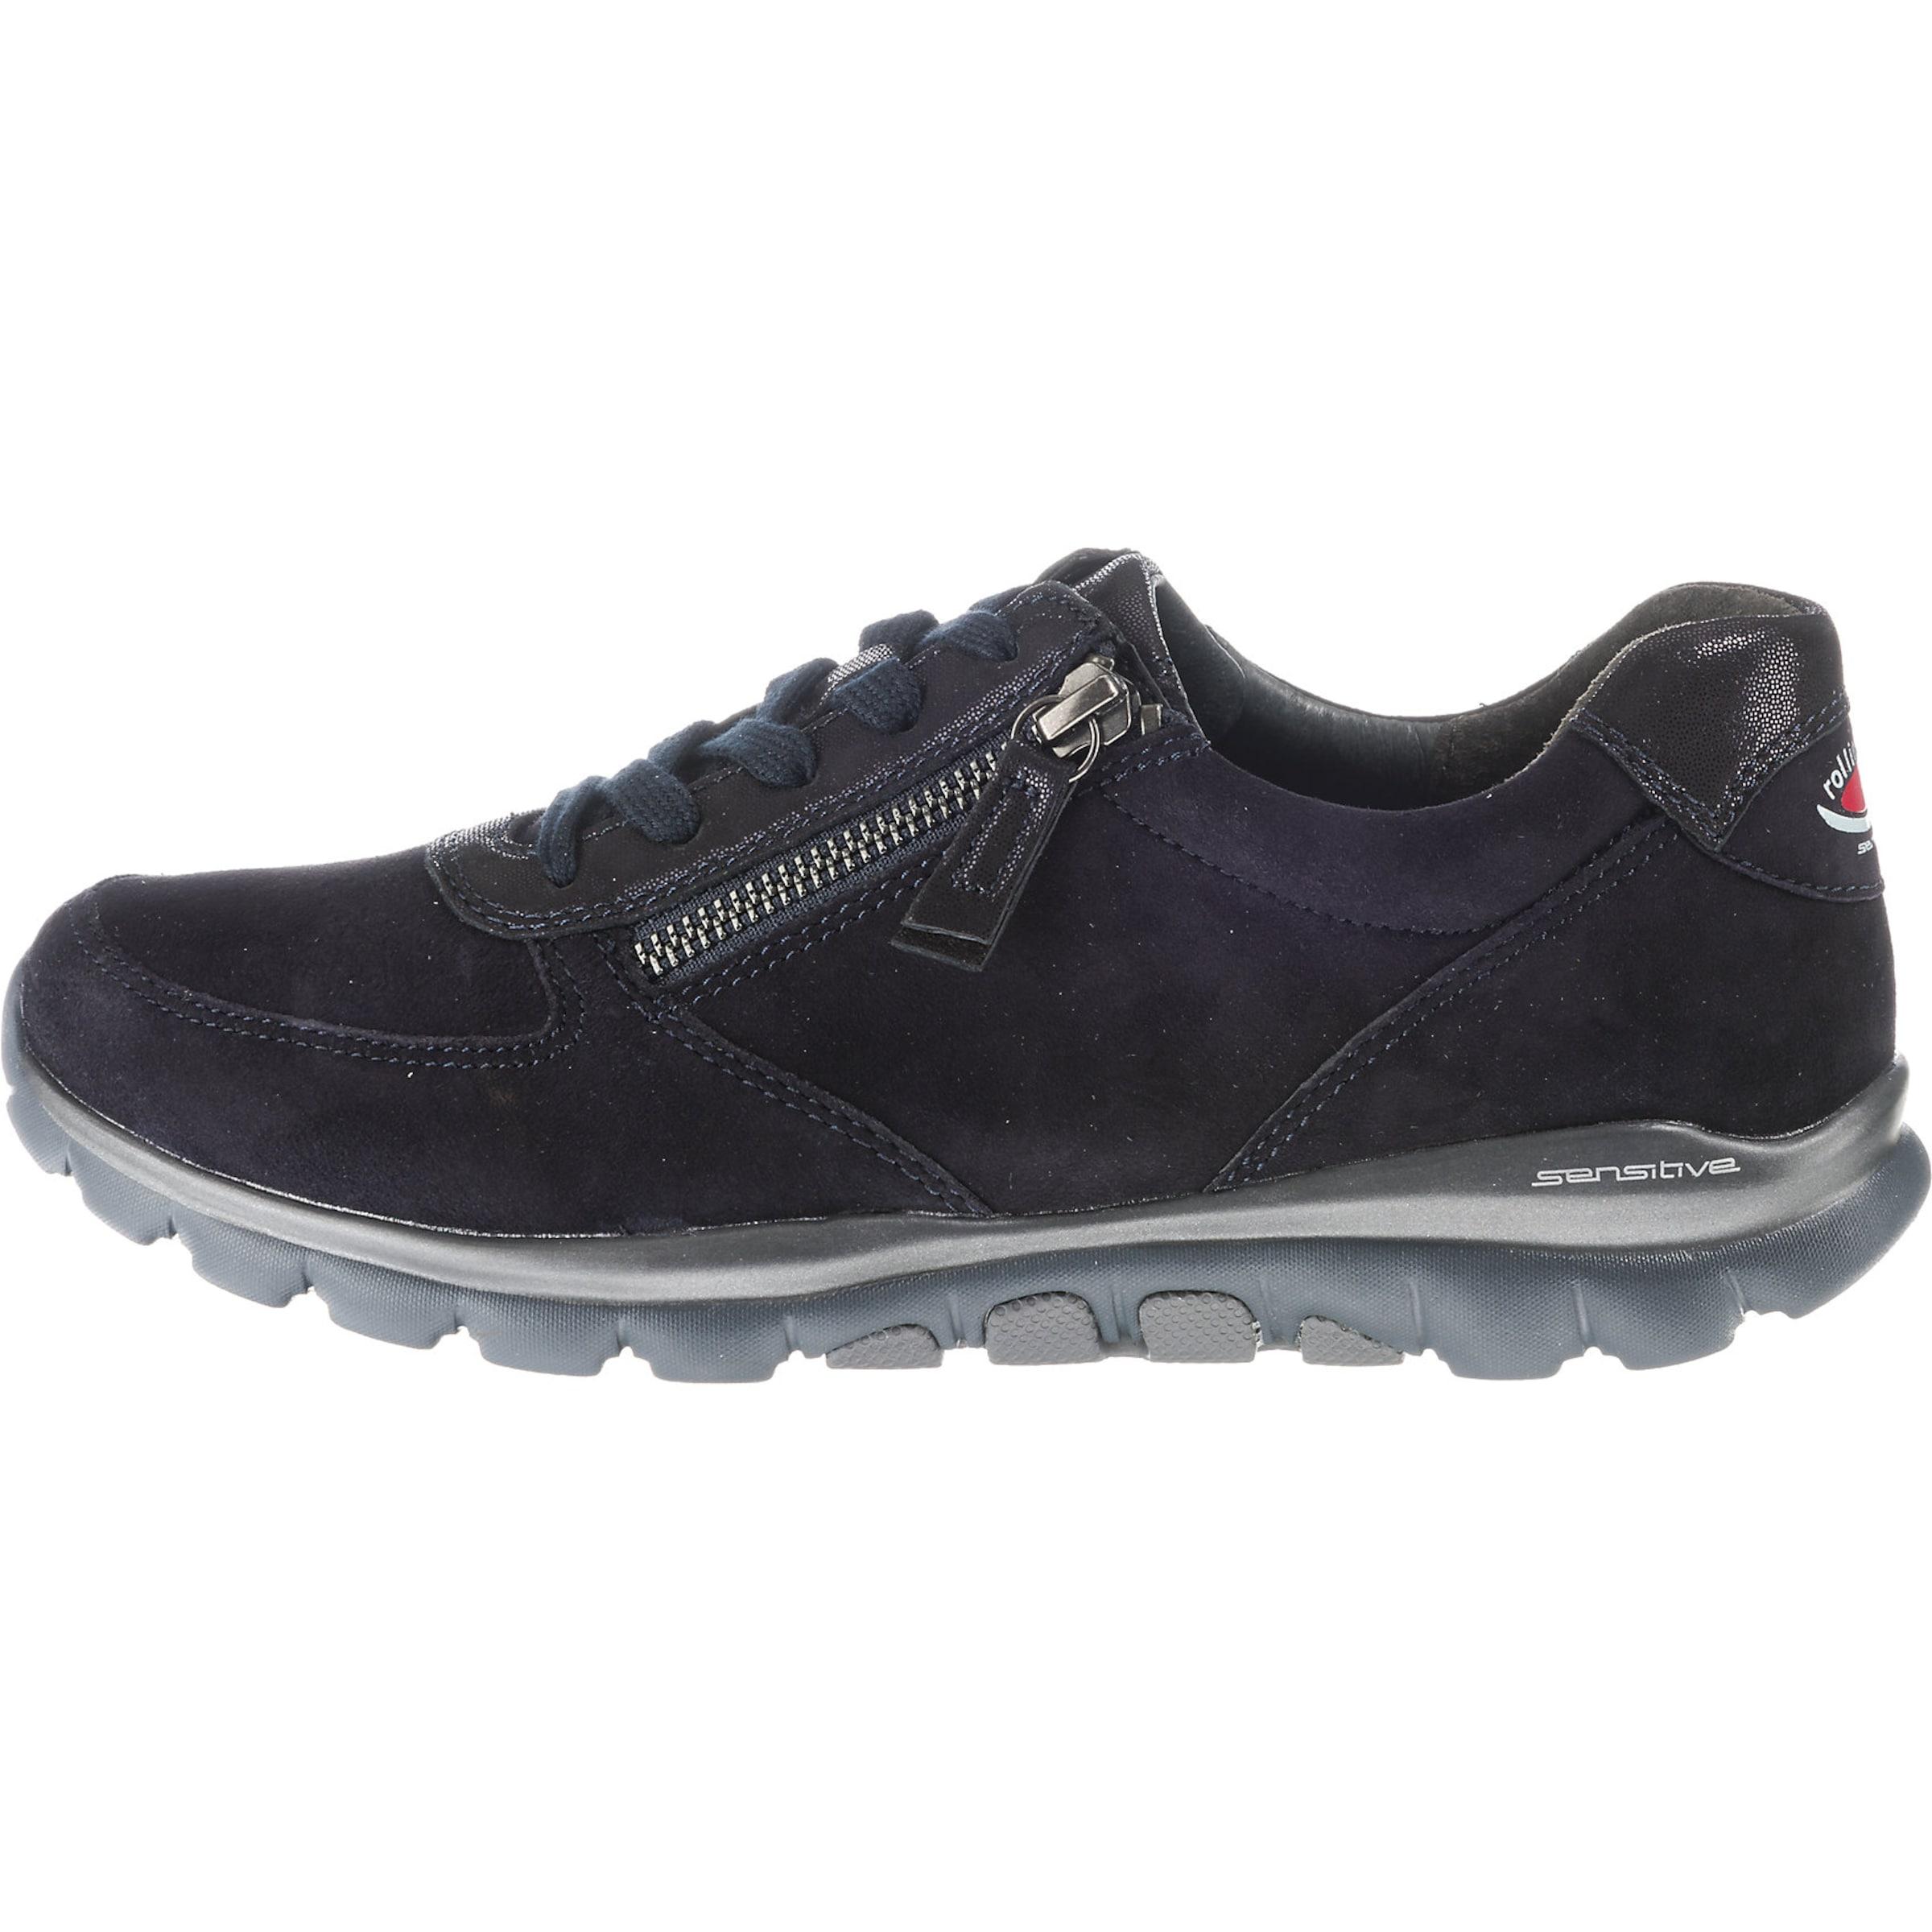 Gabor Gabor In Gabor Kobaltblau In Sneakers In Kobaltblau Kobaltblau In Sneakers Sneakers Sneakers Gabor 80vmNwn